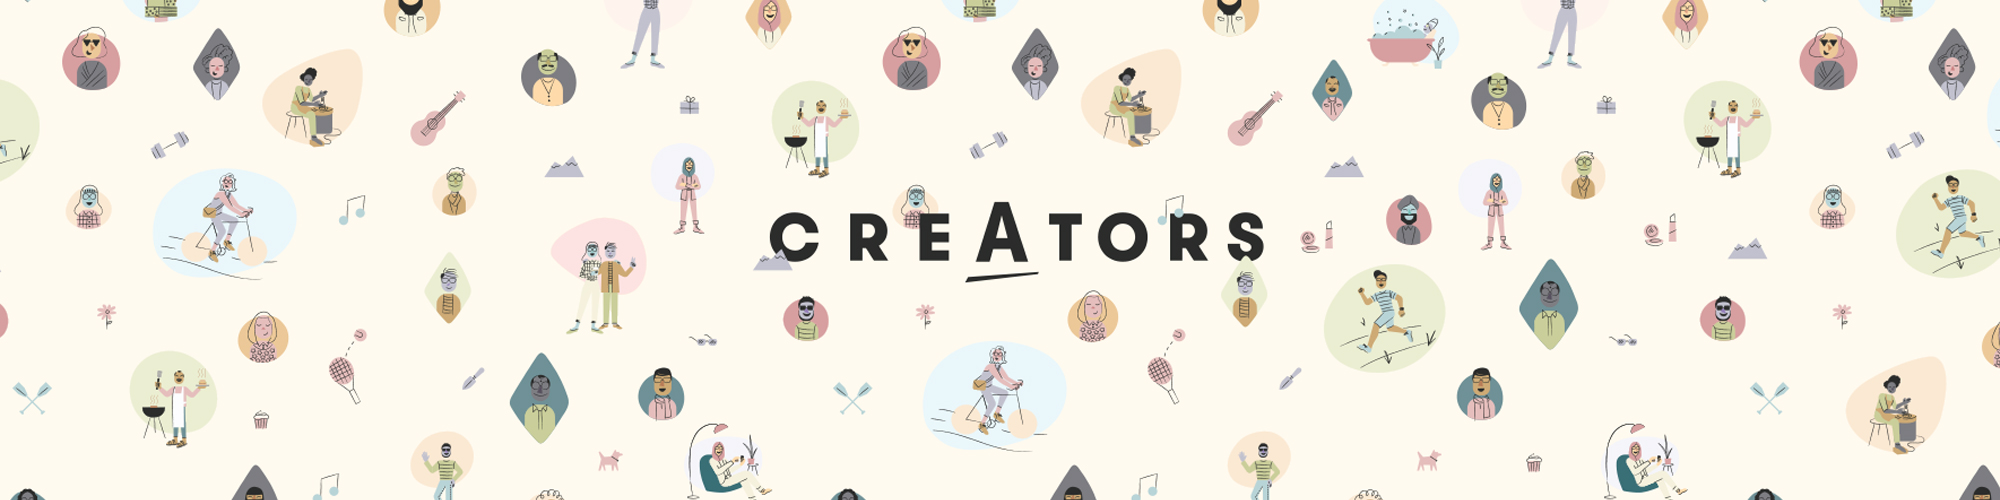 Introducing Creators